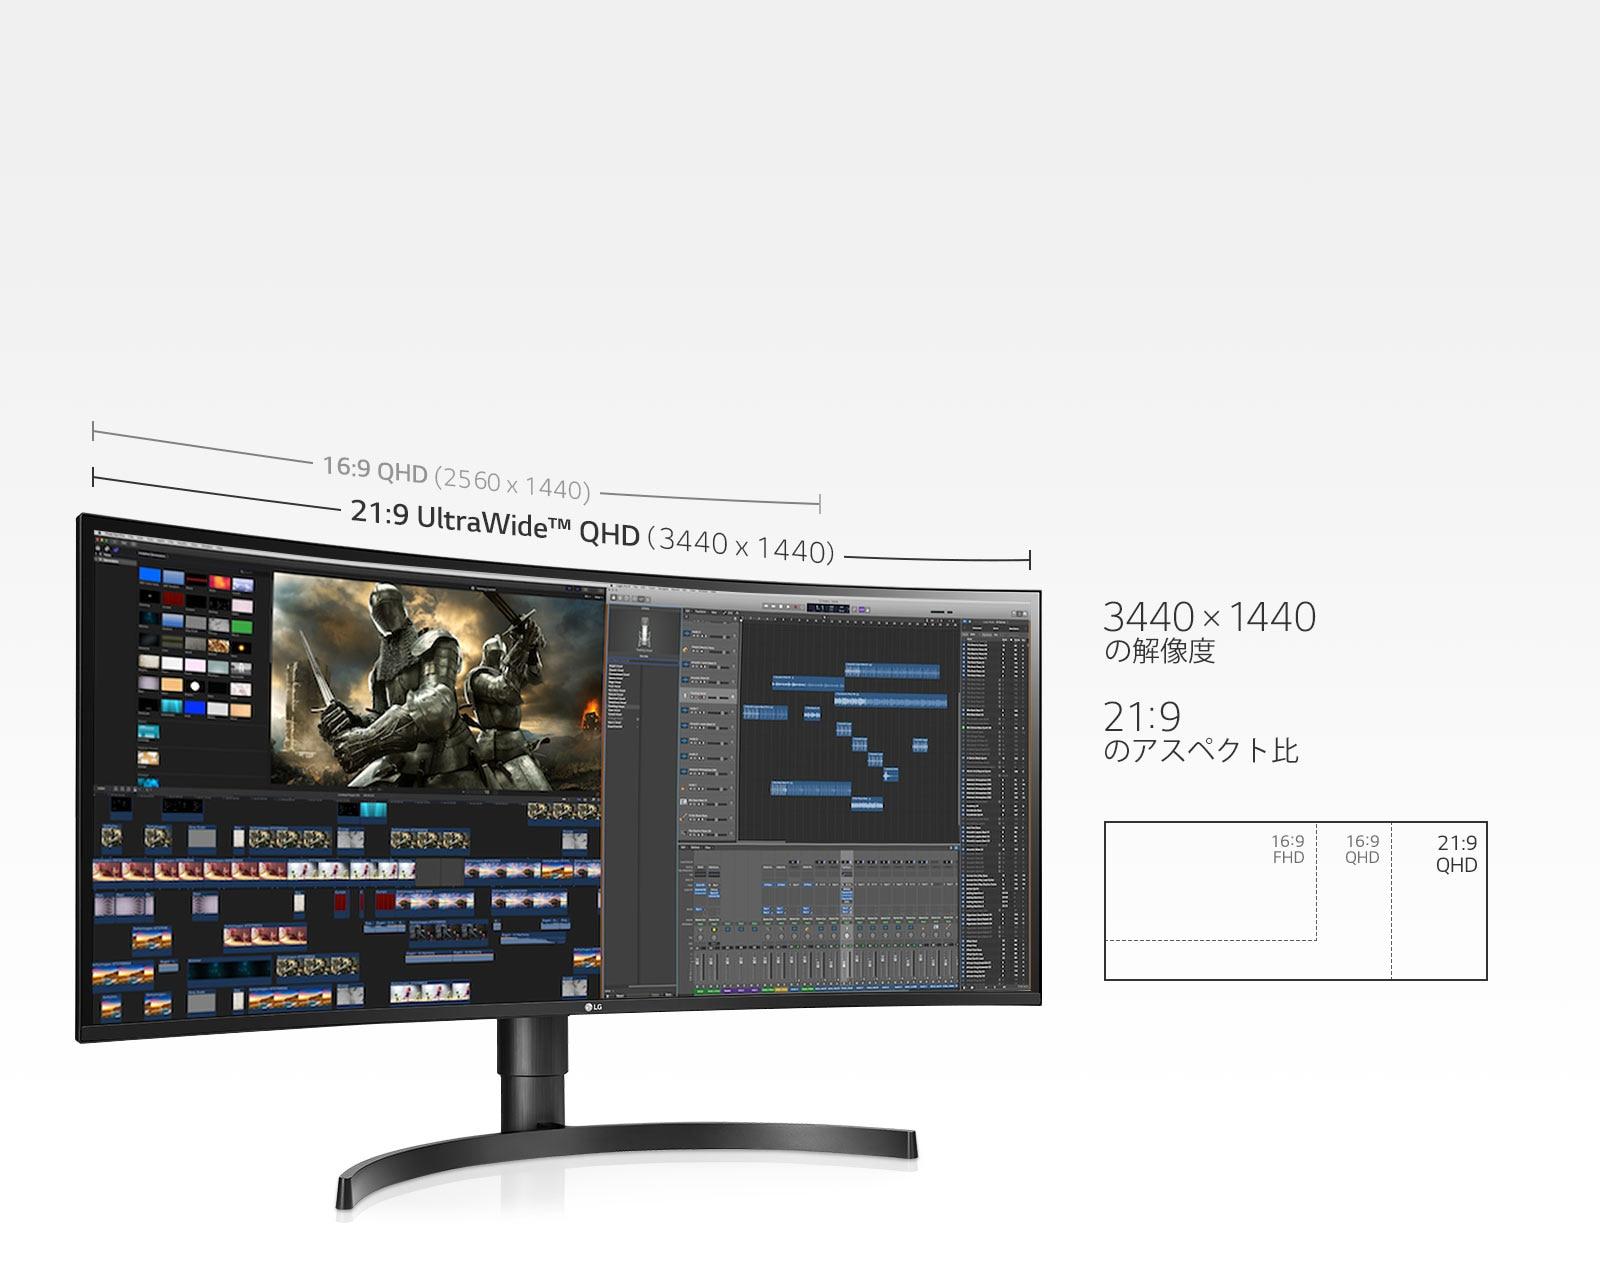 MNT-34WL85C-02-UltraWide-QHD-Desktop